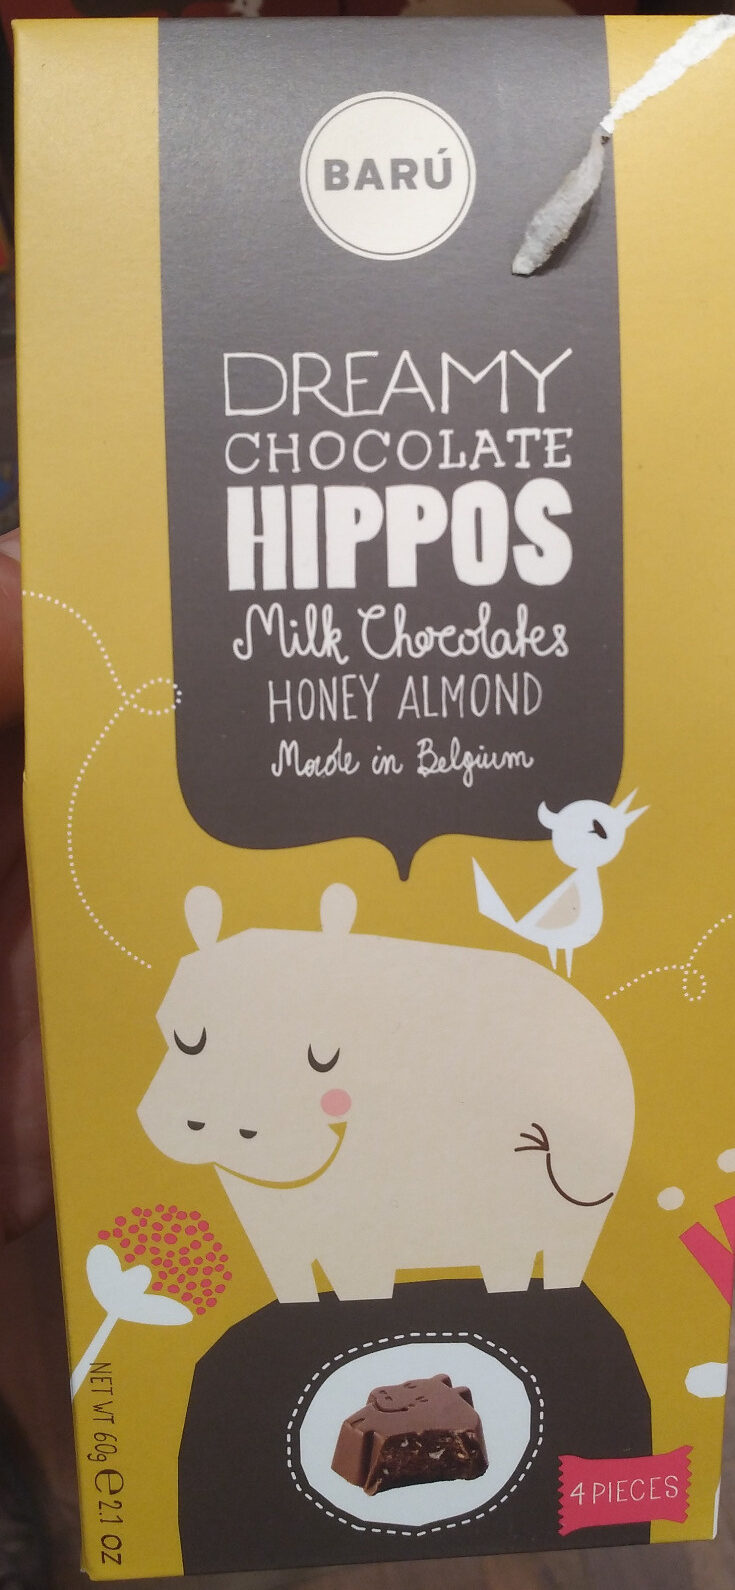 Hippos - Milk Chocolates Honey Almond - Product - nl